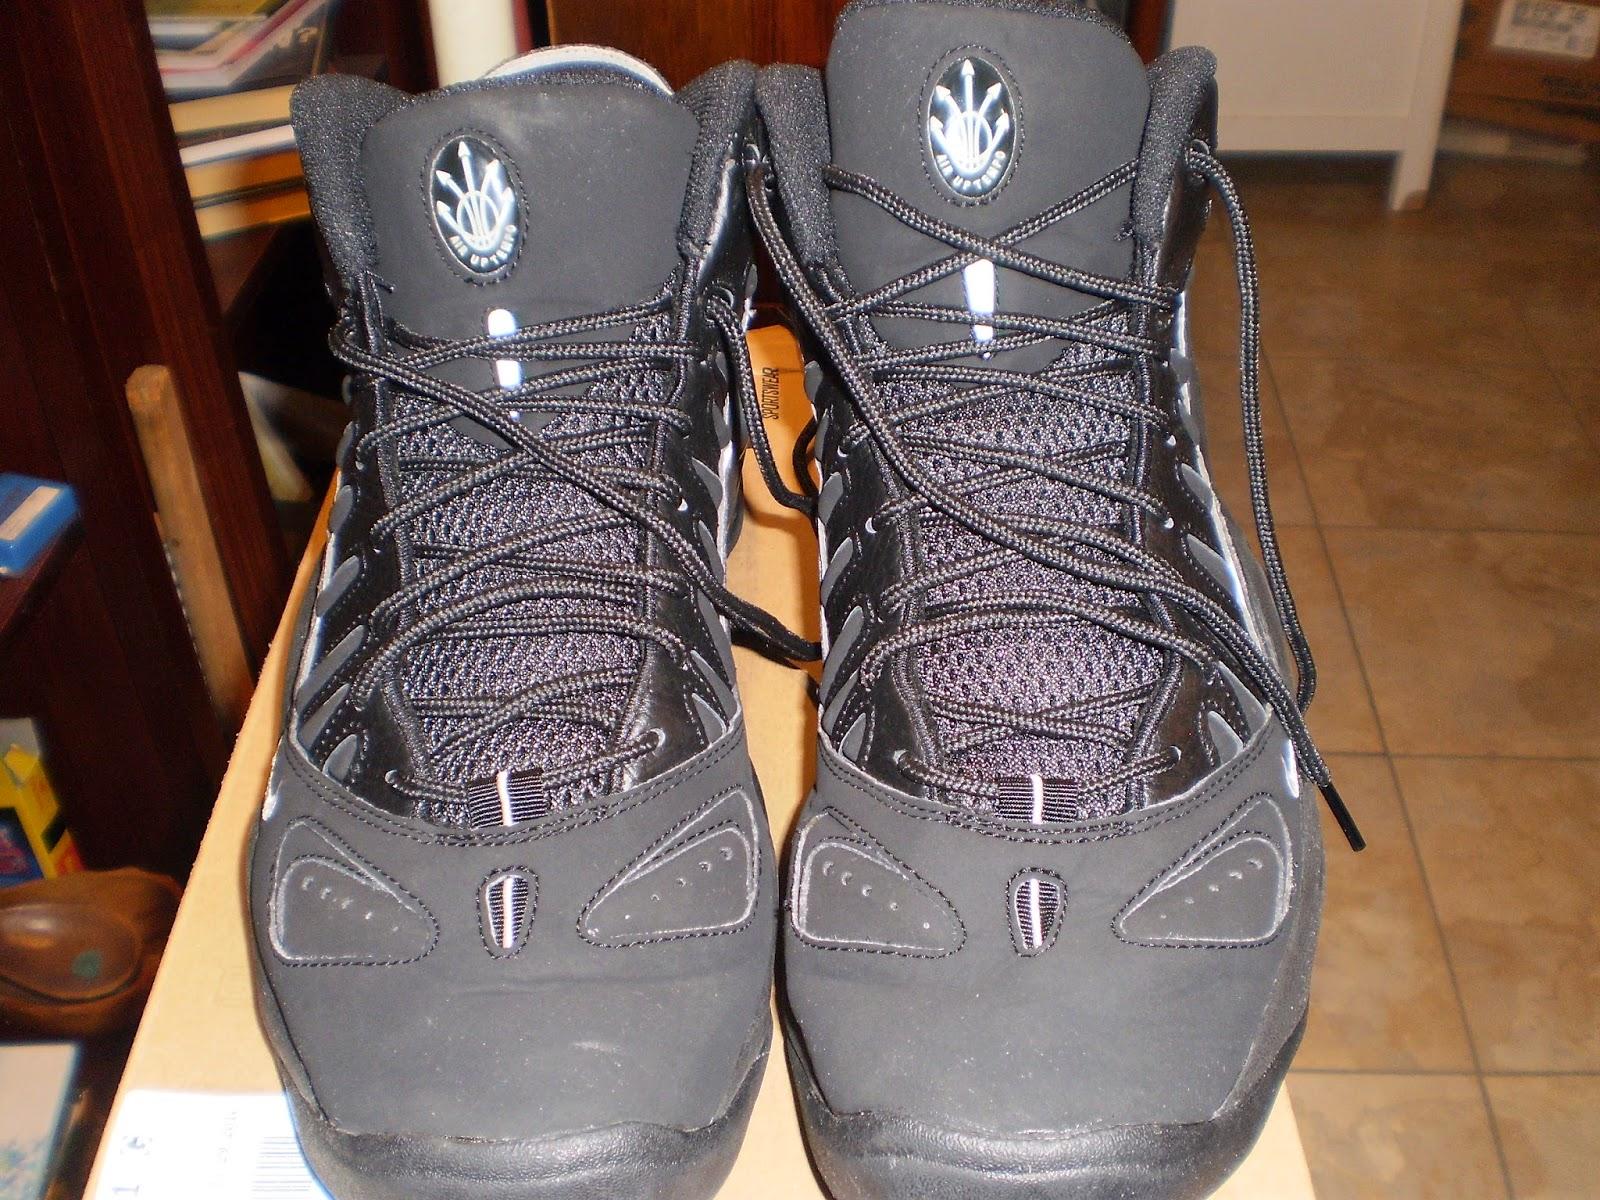 addict4sneakas: 2010 Nike Air Max Uptempo 97 BlackRed